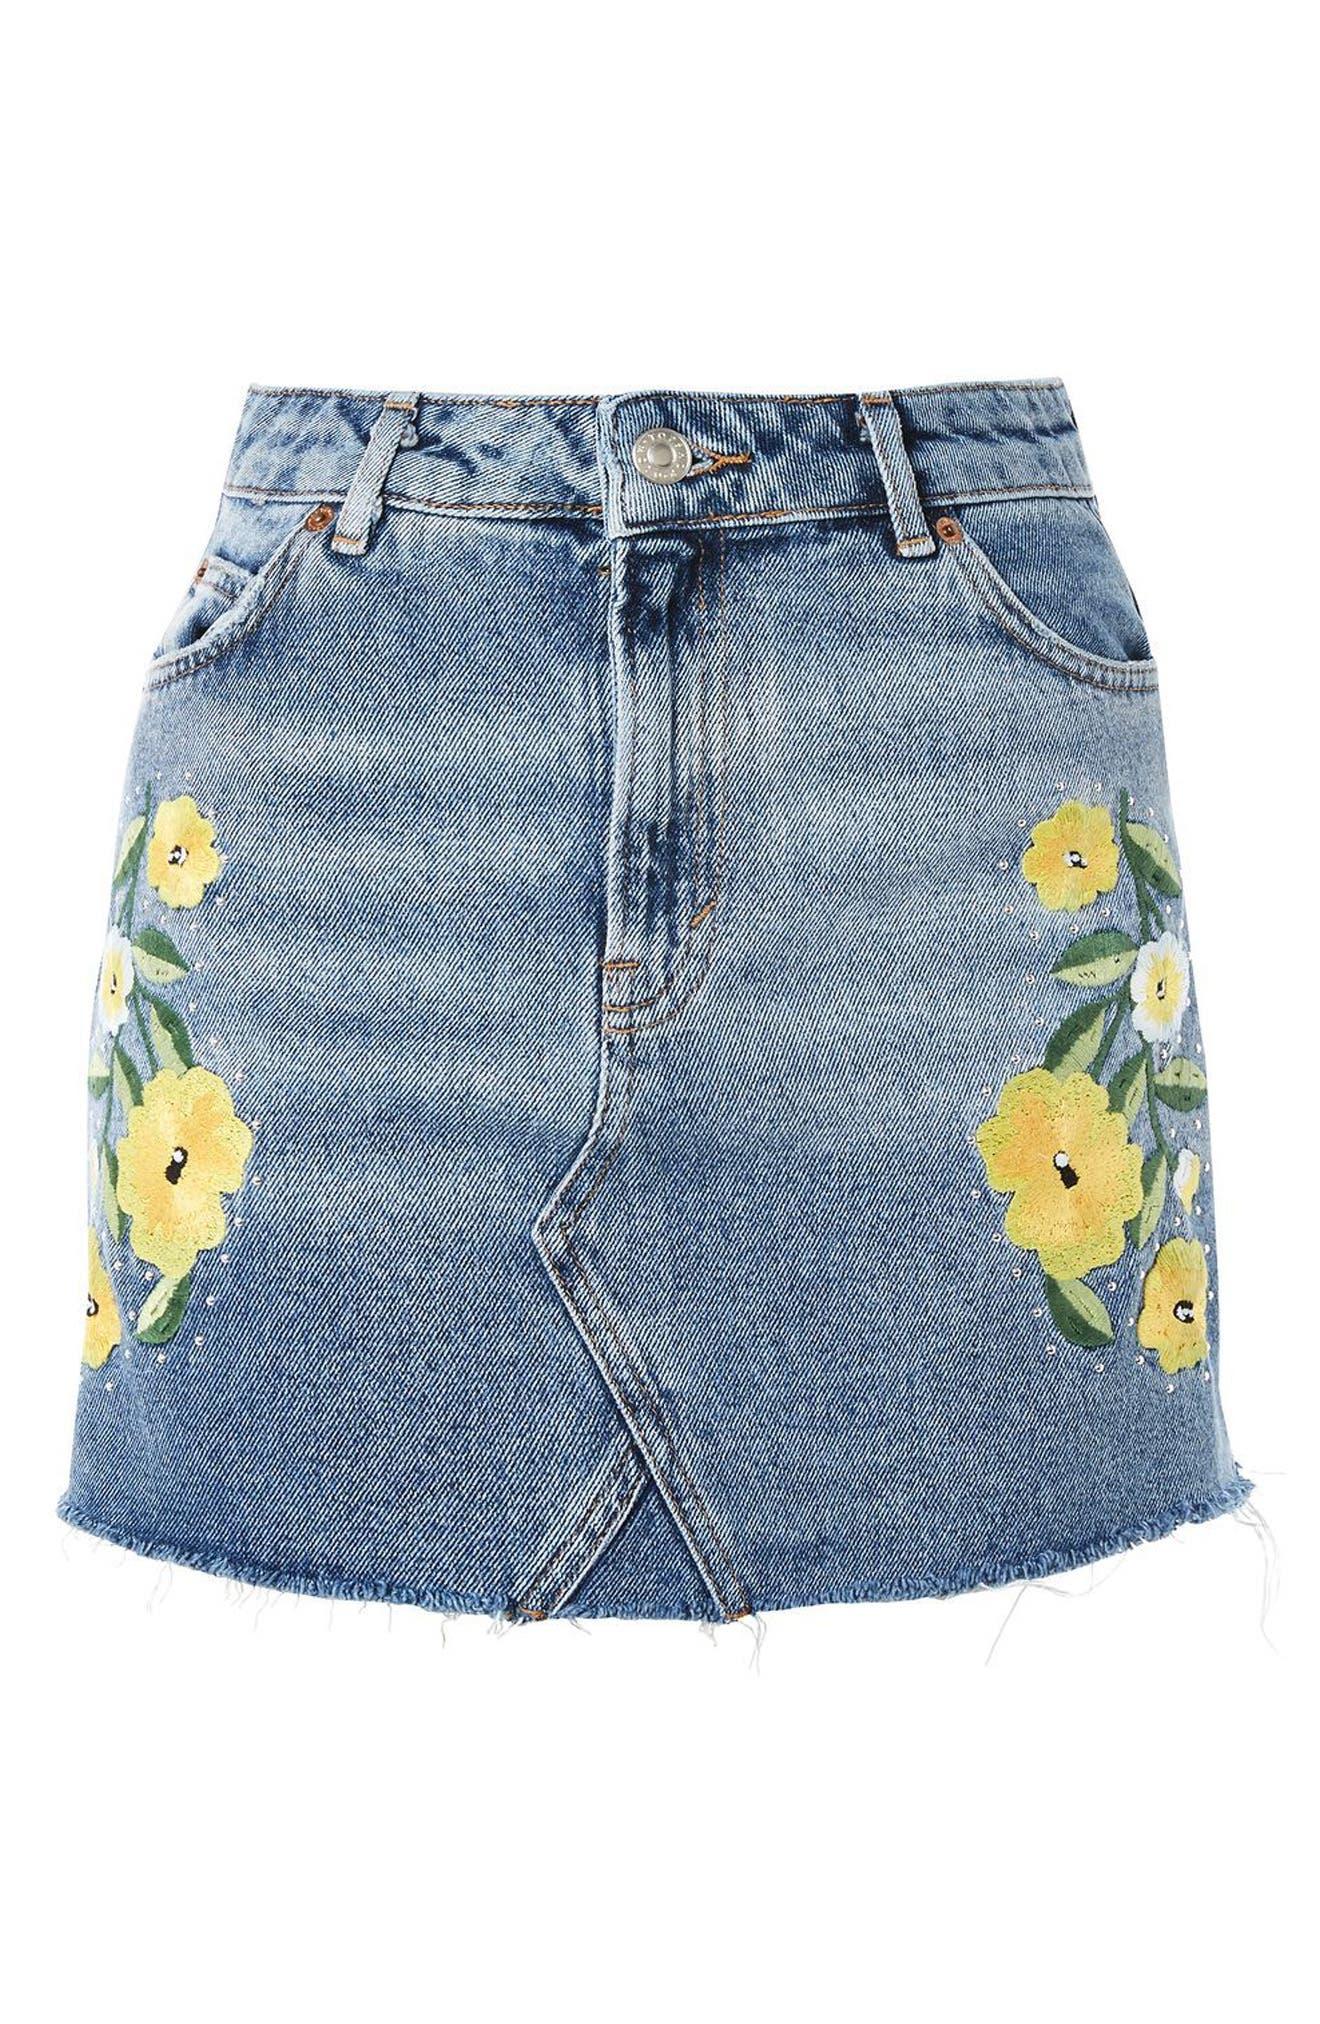 Floral Stud Denim Miniskirt,                             Alternate thumbnail 3, color,                             400